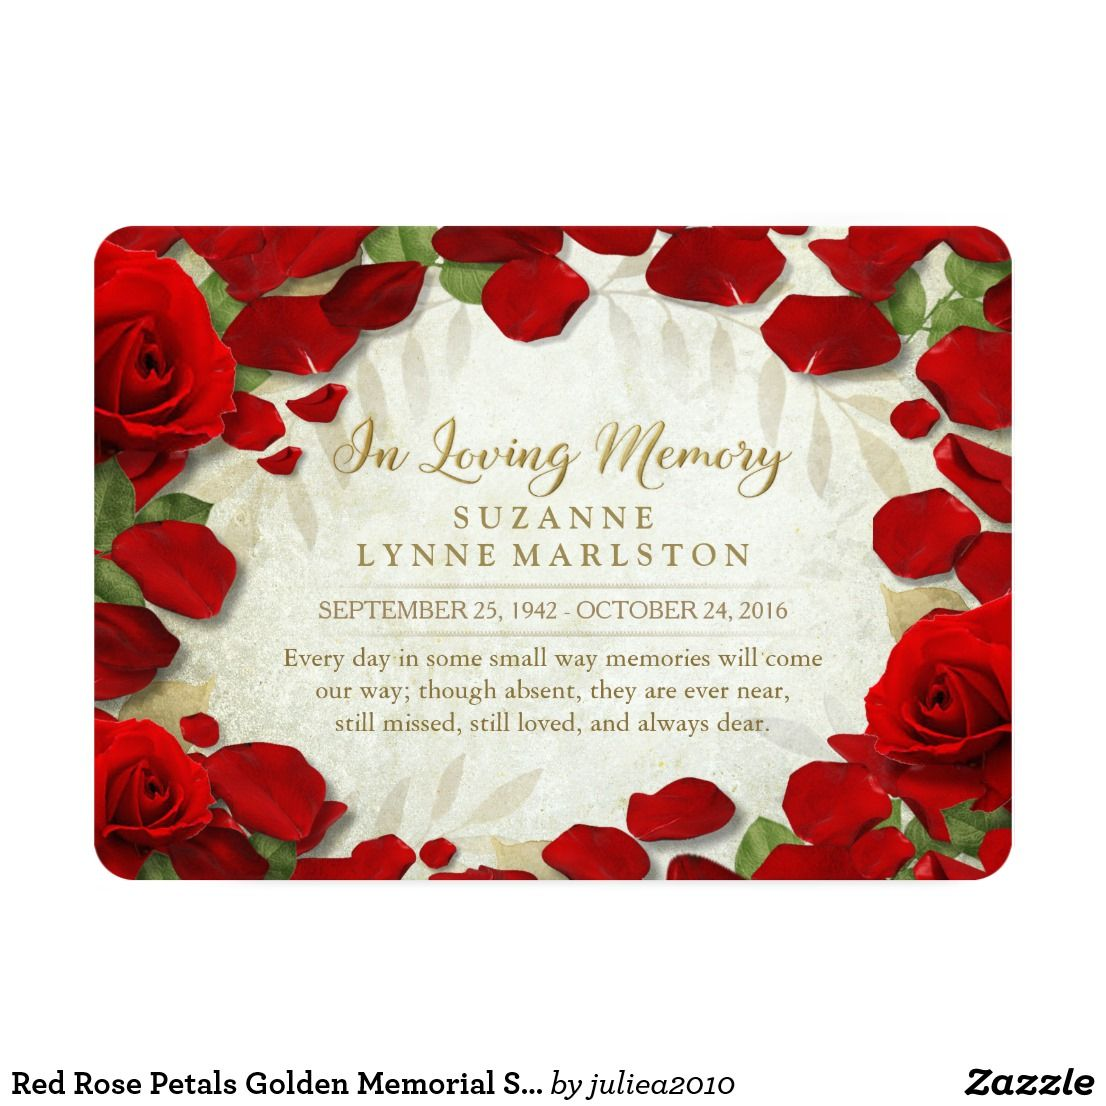 Red Rose Petals Golden Memorial Service Invitation | Funeral ...